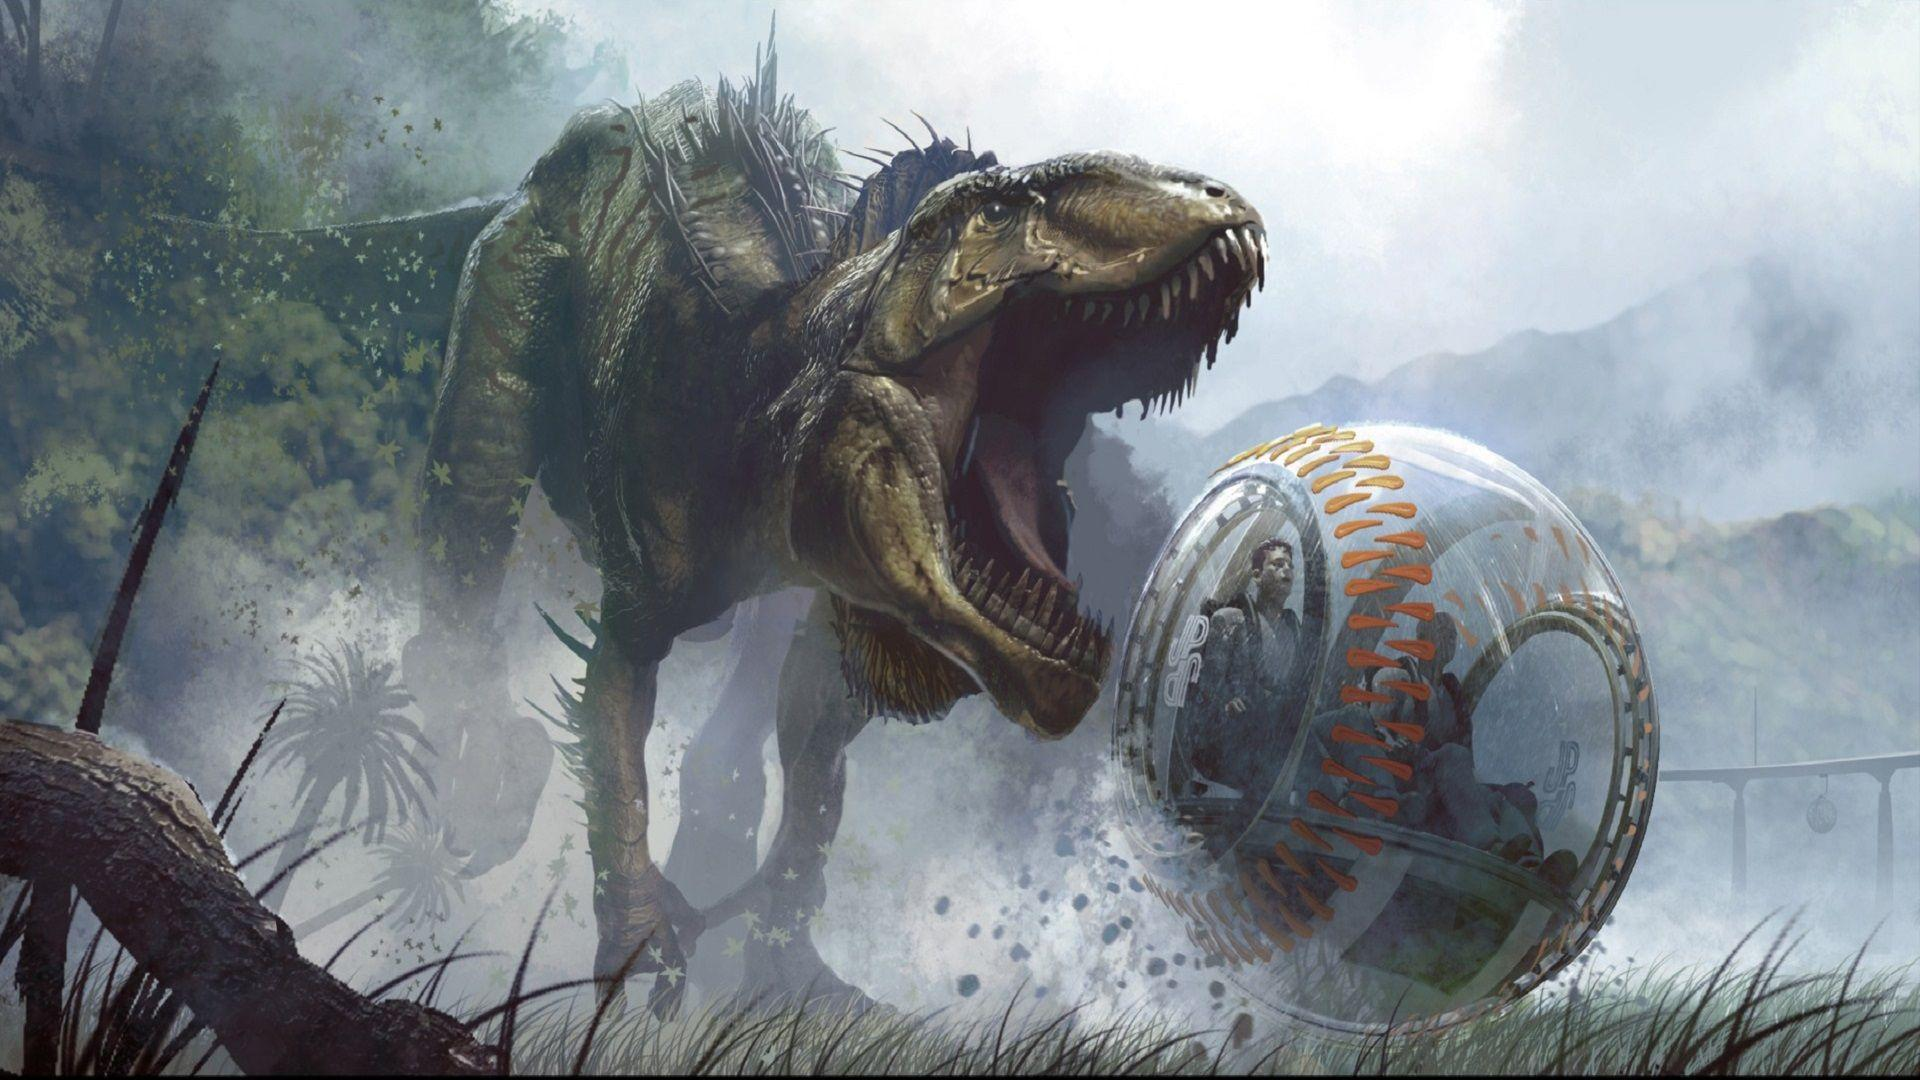 Jurassic World: Fallen Kingdom HD Wallpapers - Wallpaper Cave